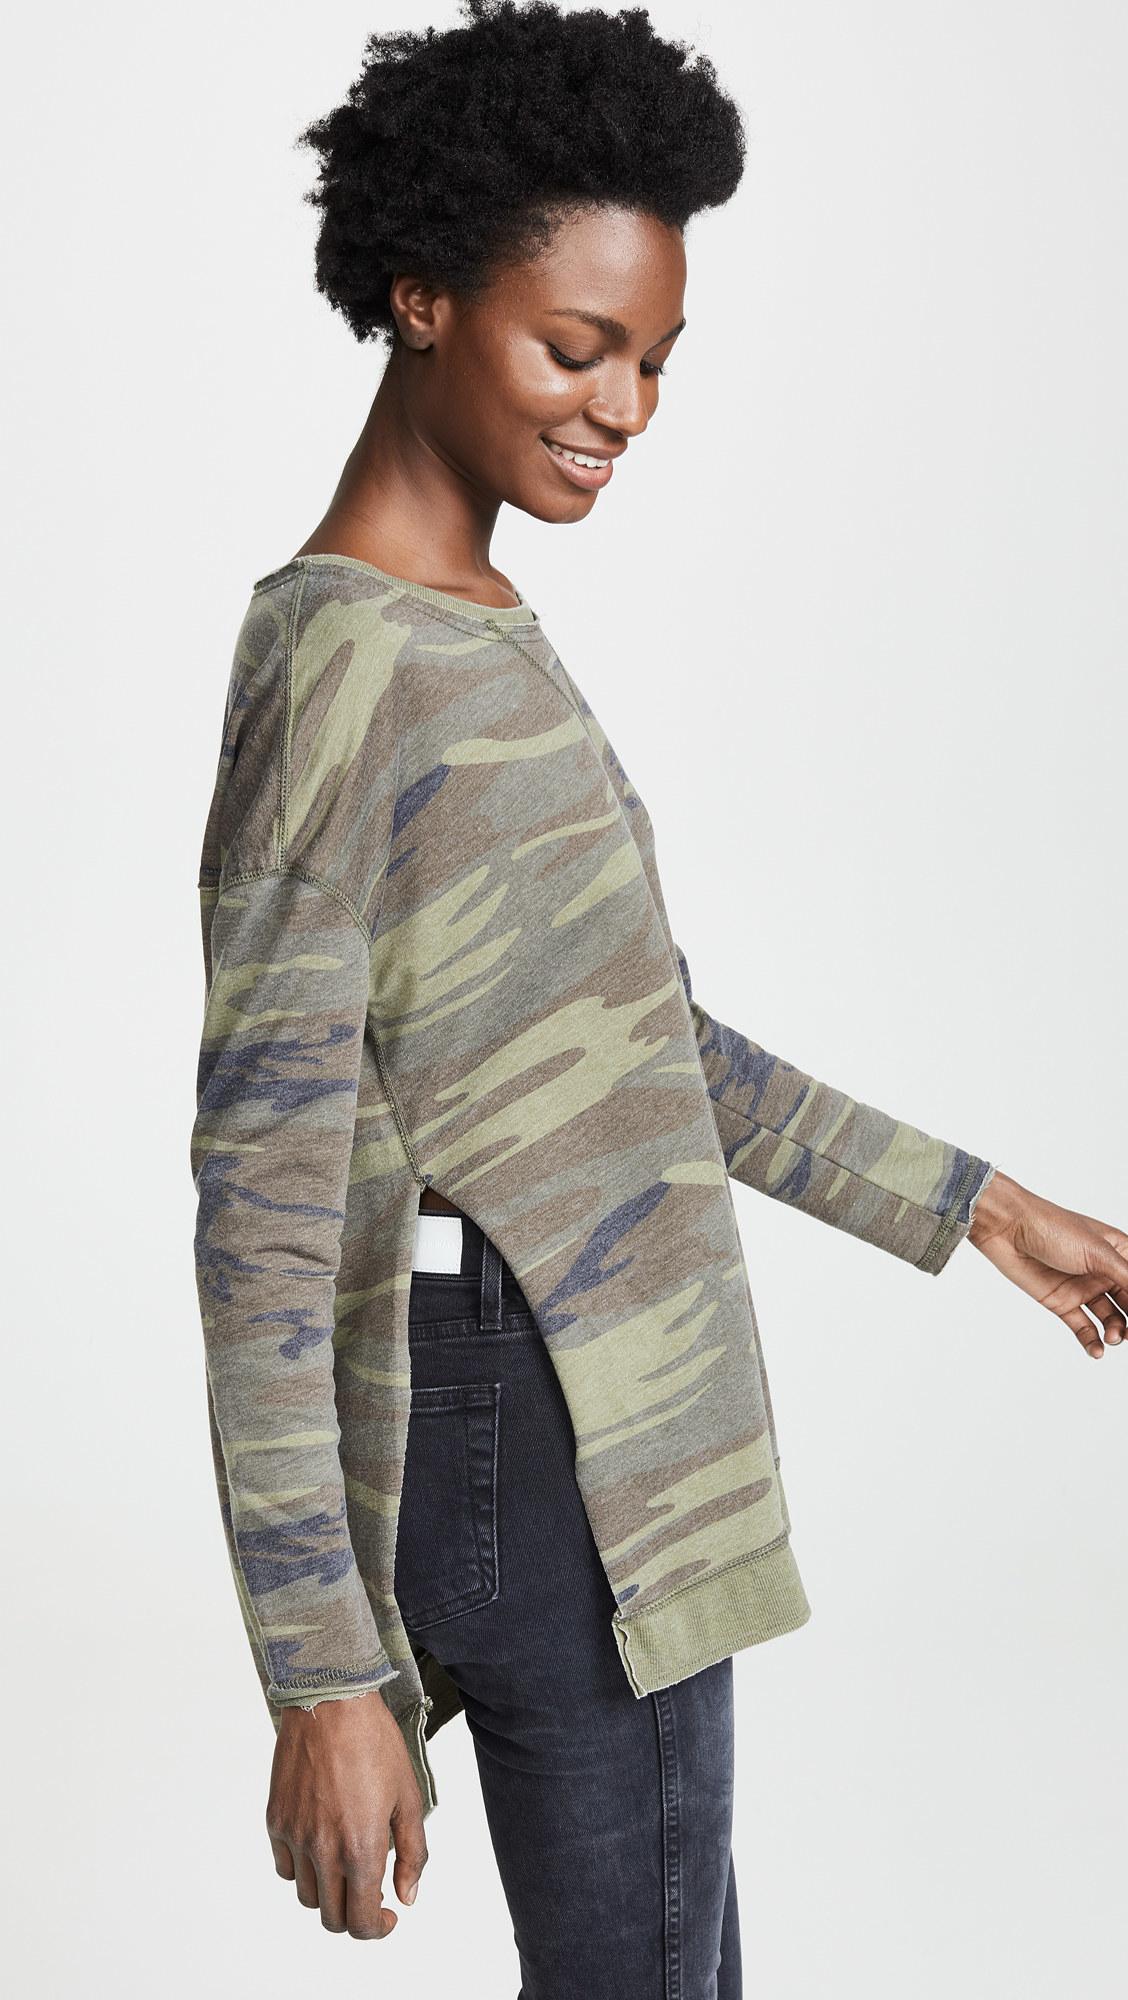 a model wearing the long sleeve green camo top